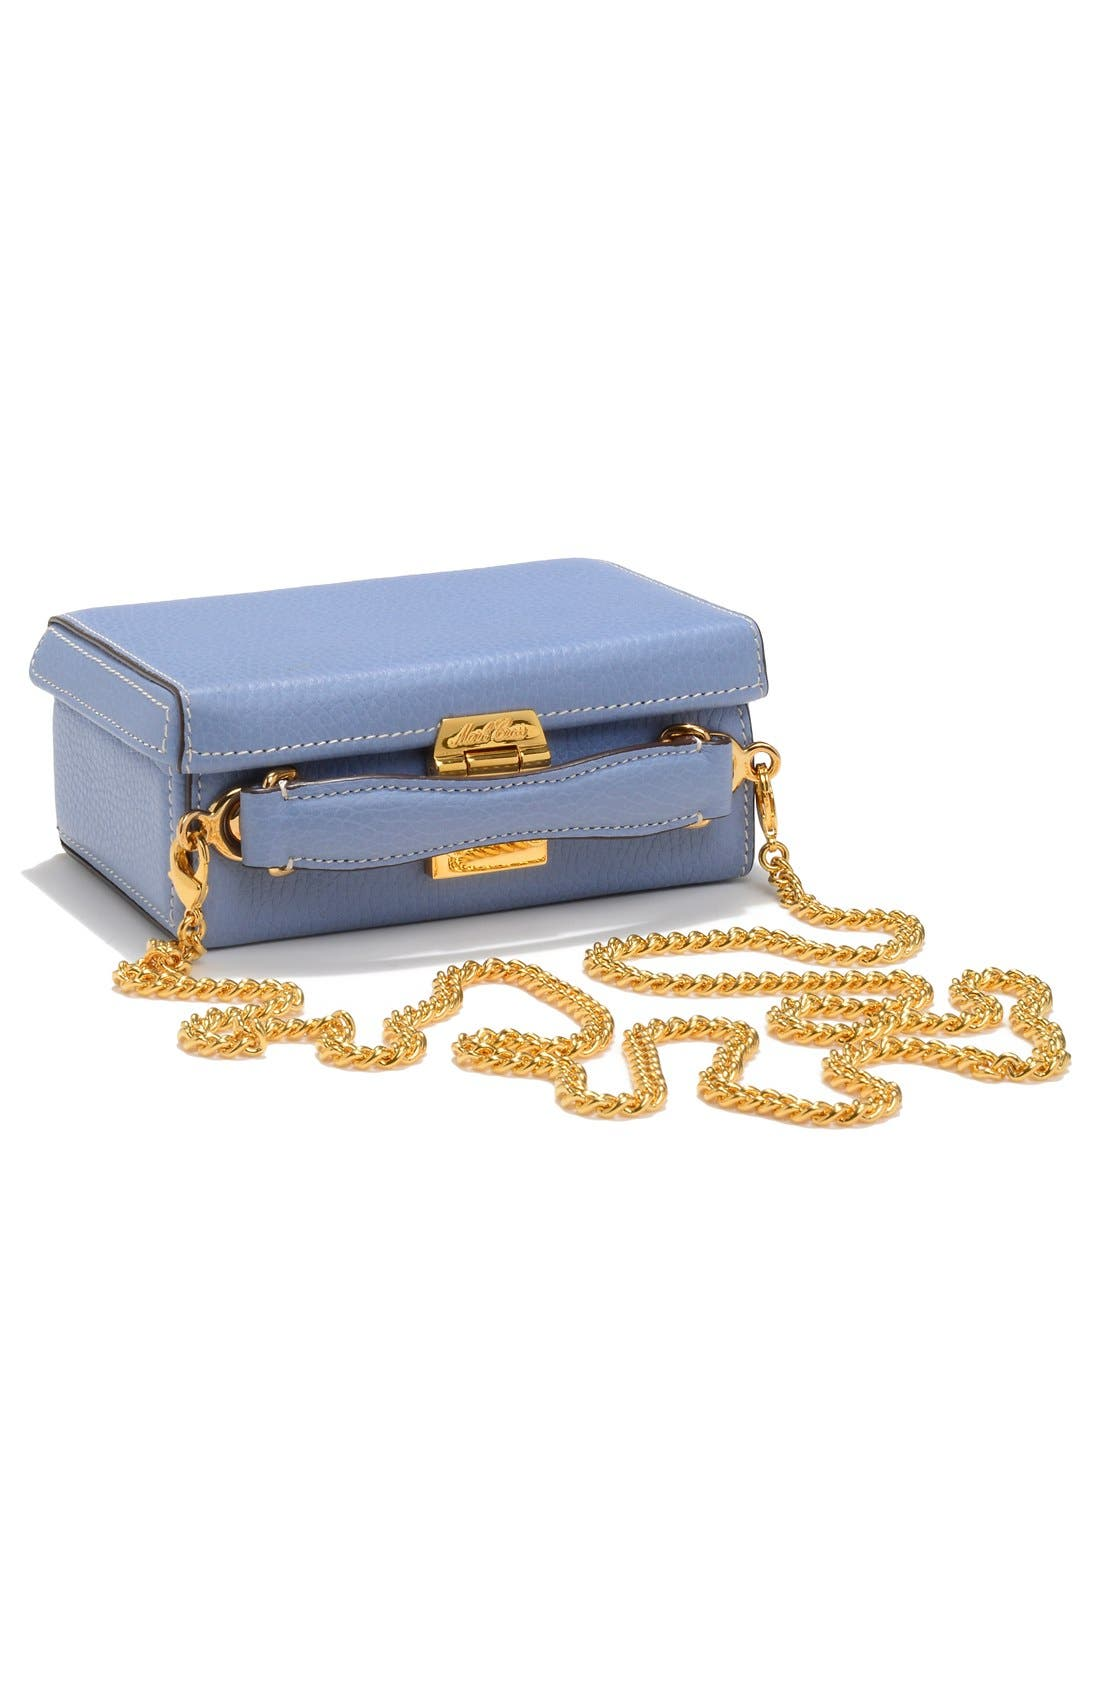 Alternate Image 3  - Mark Cross 'Mini Grace' Pebbled Leather Box Bag